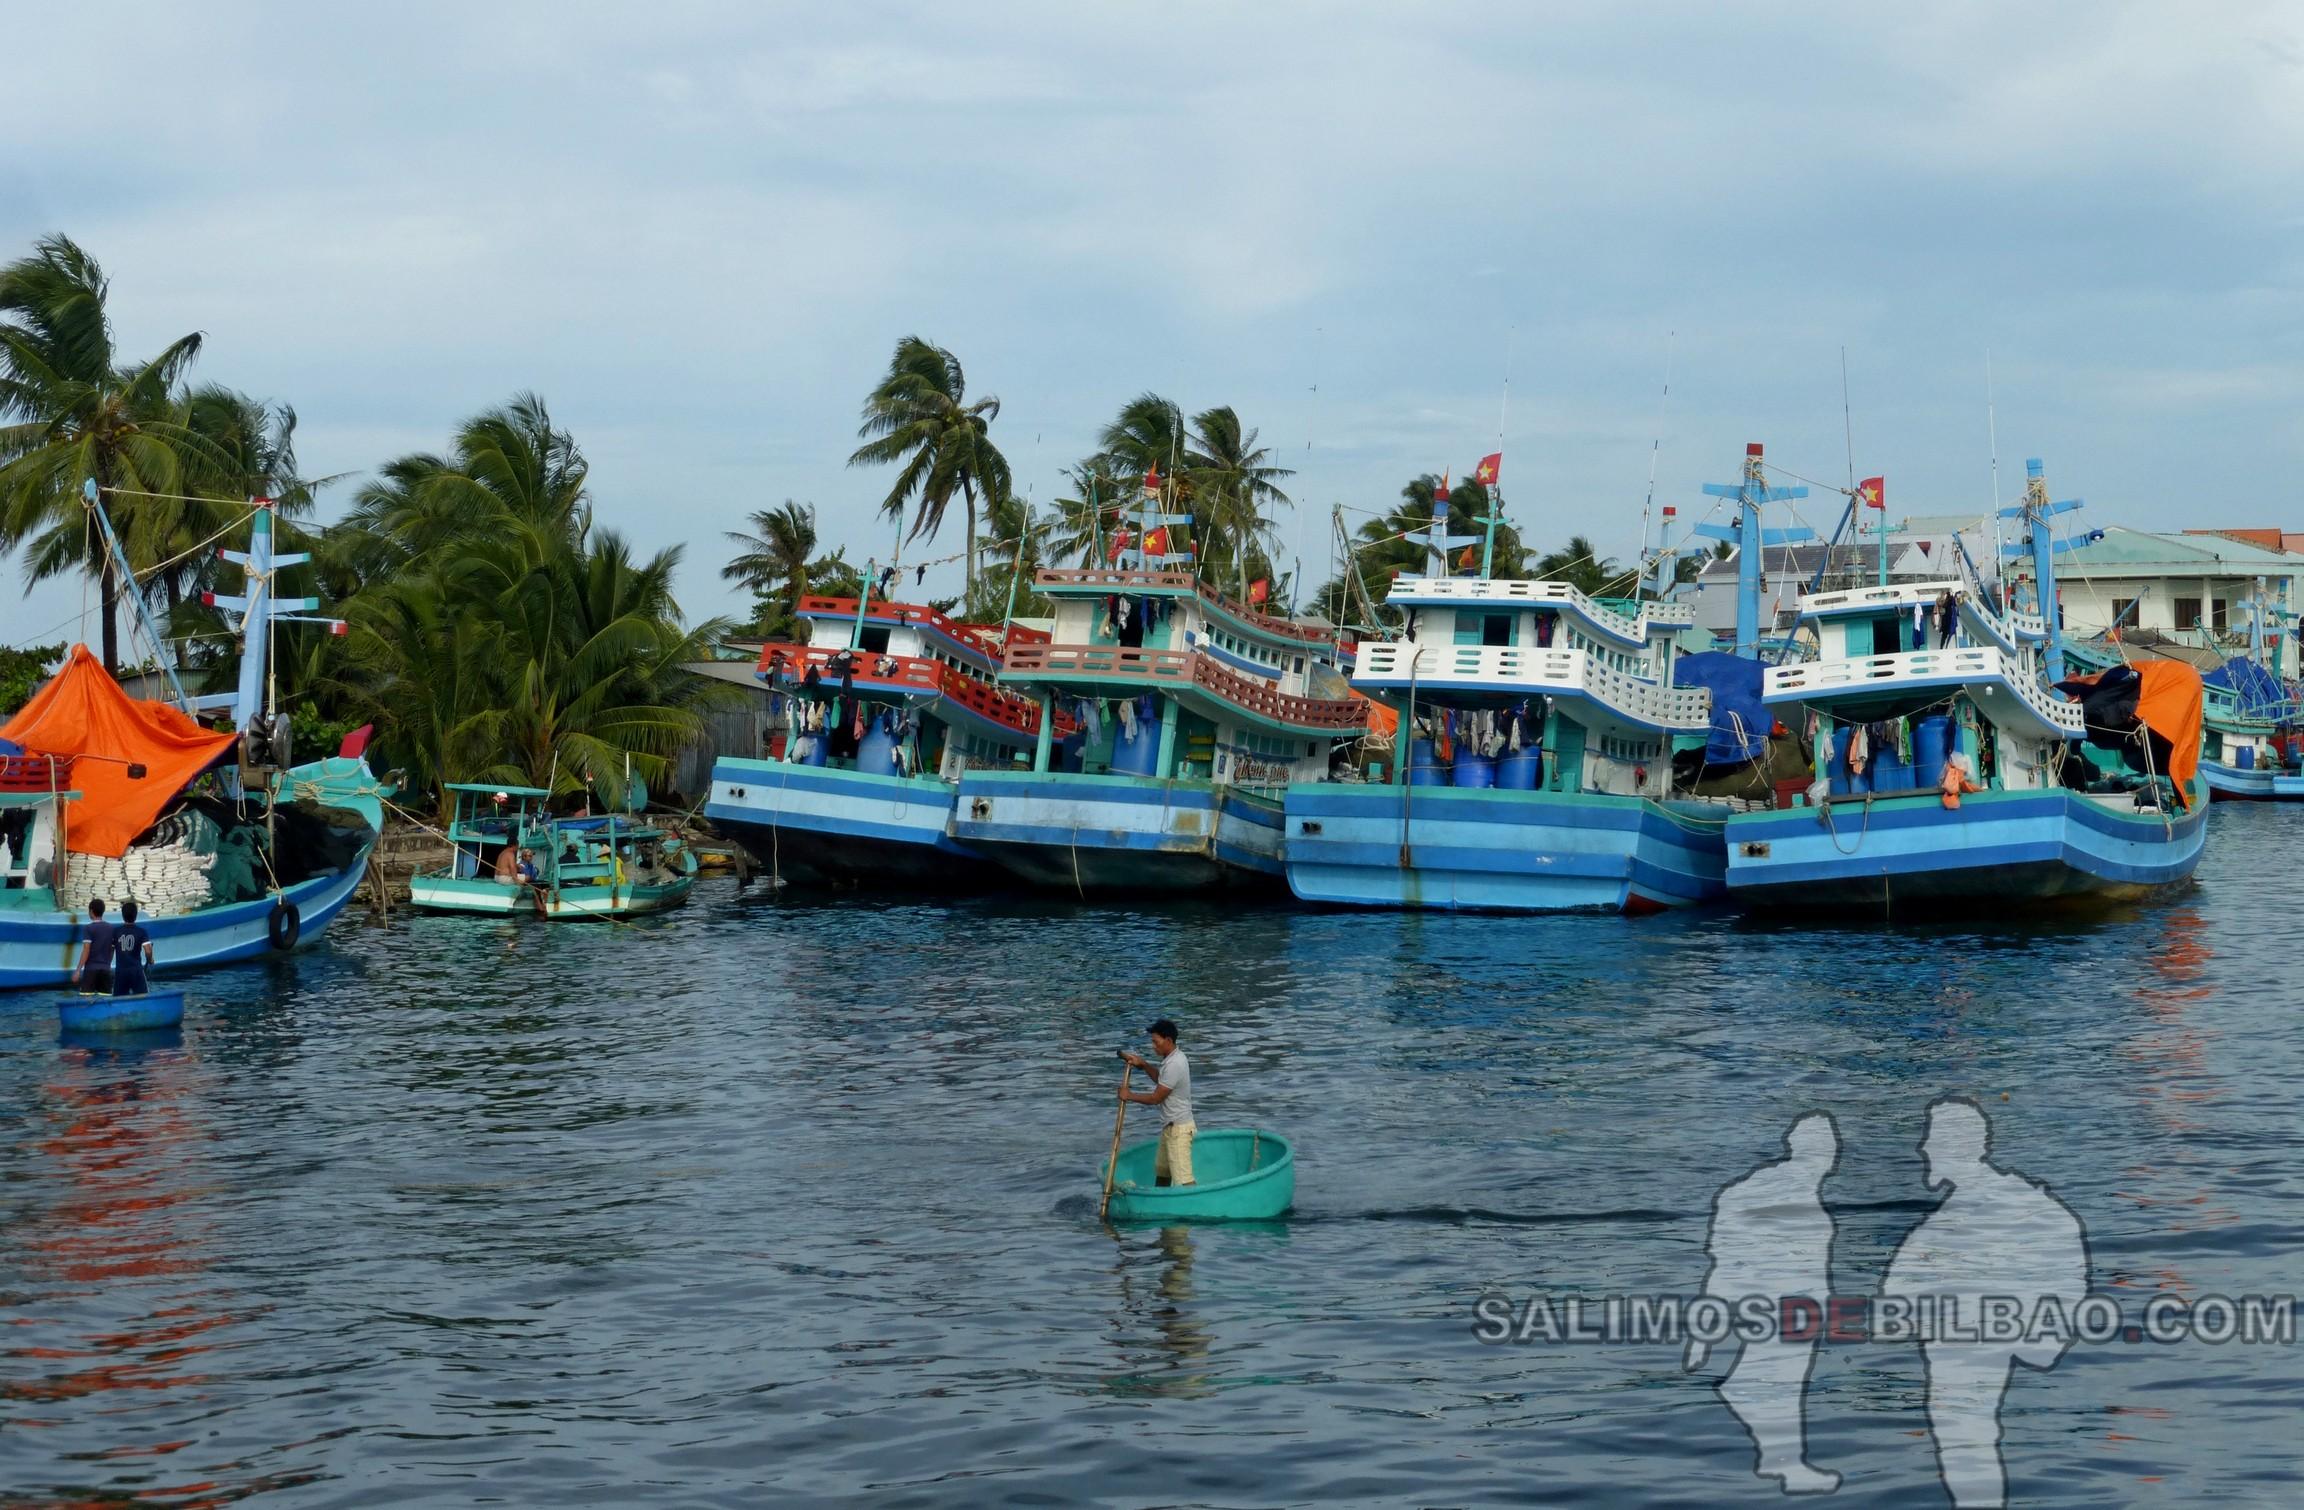 0067. Excursión al norte, Puerto de Duong Dong, Phu Quoc